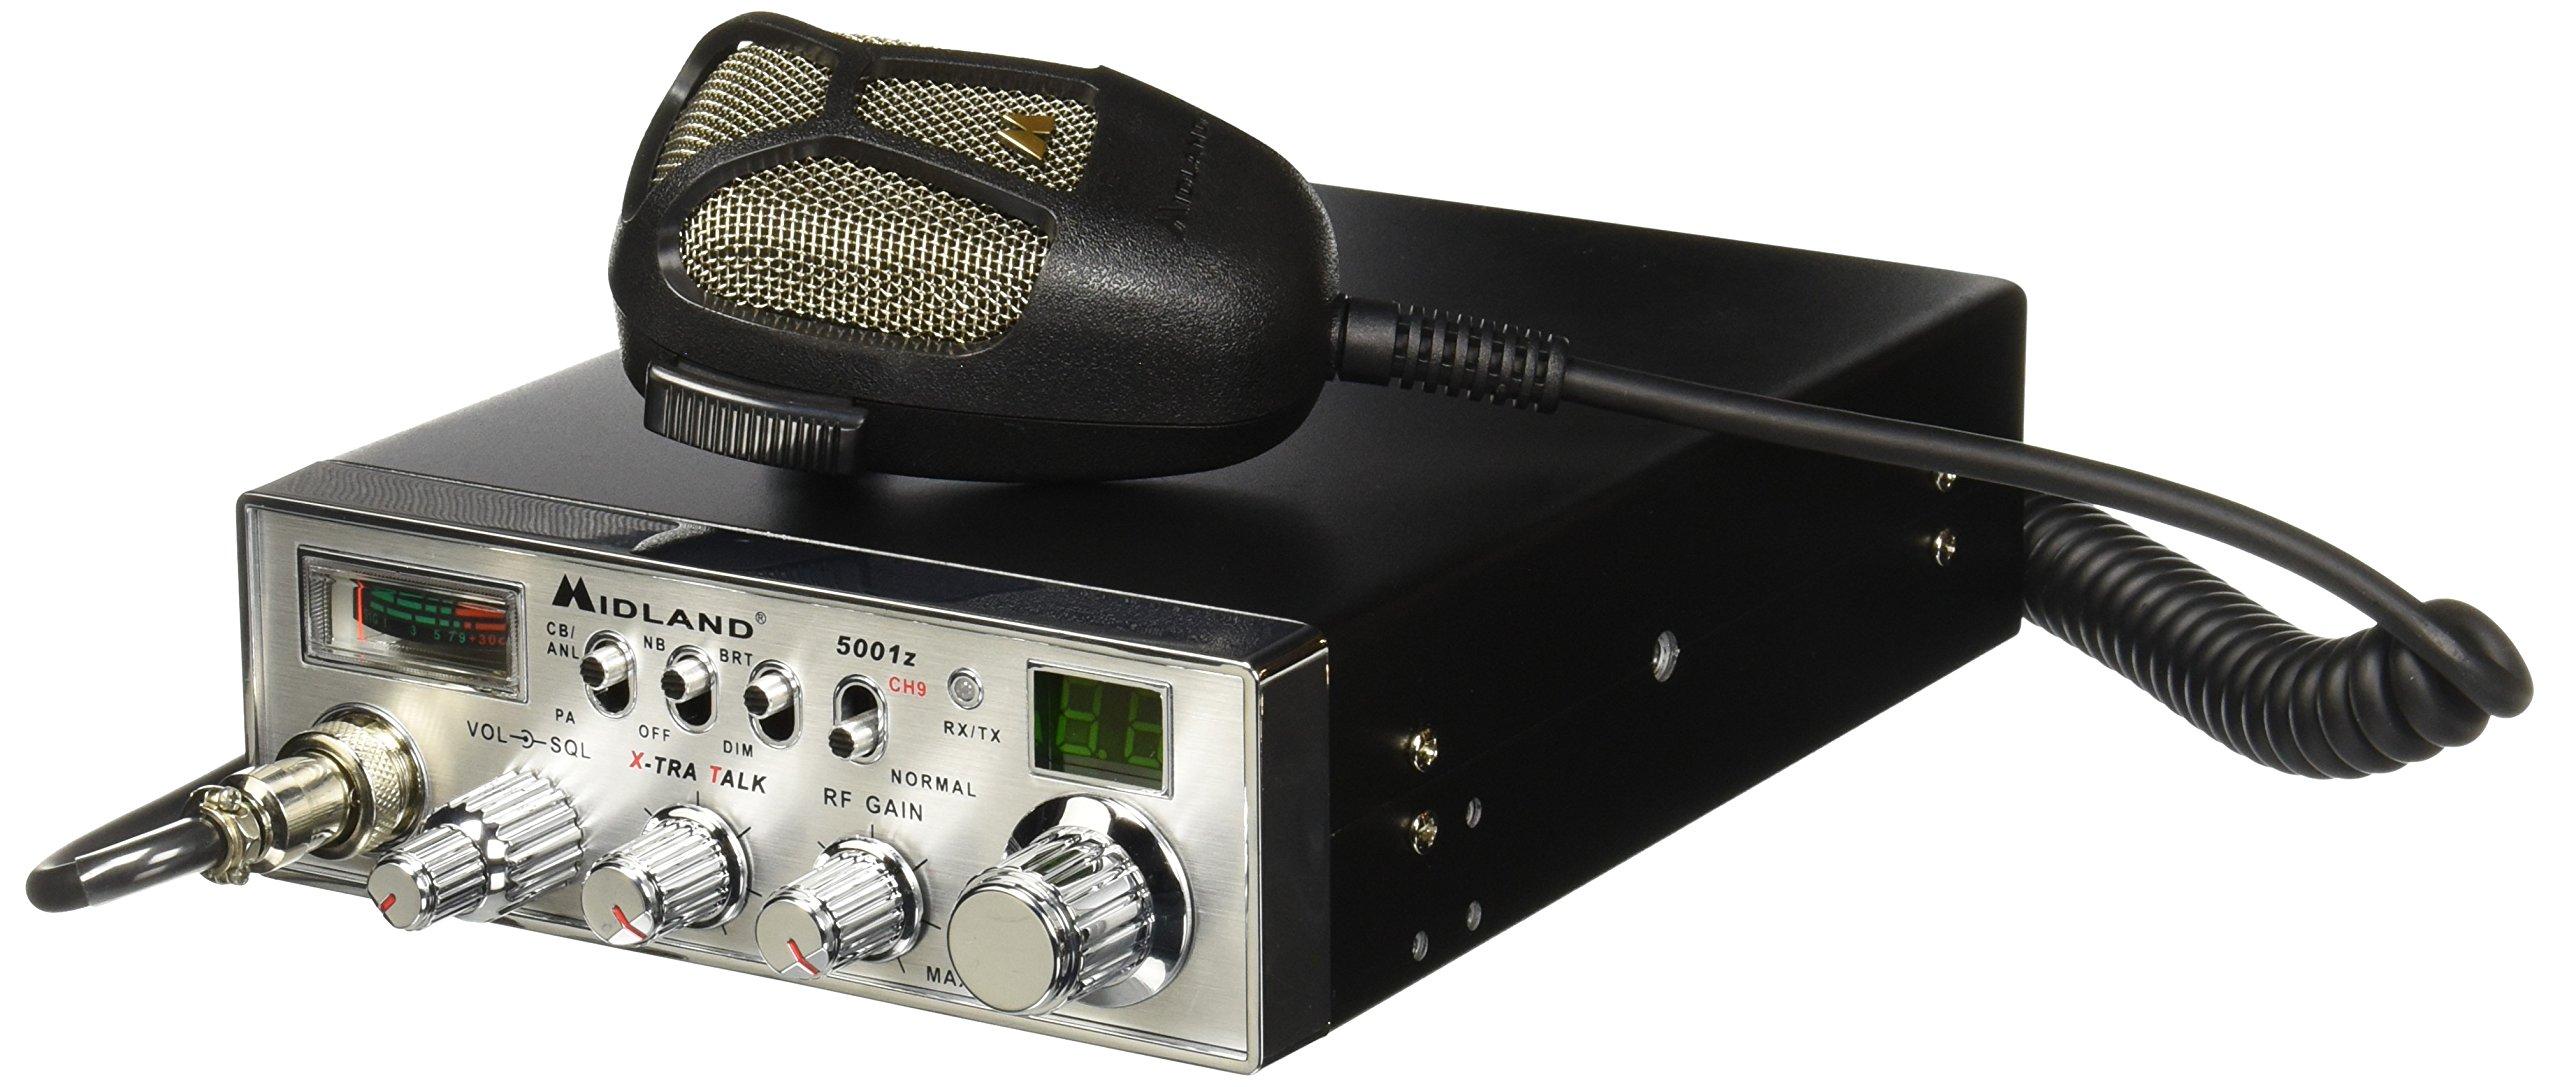 Midland Radios 5001 40 Ch Full Feature Mobile CB Radio w/PA